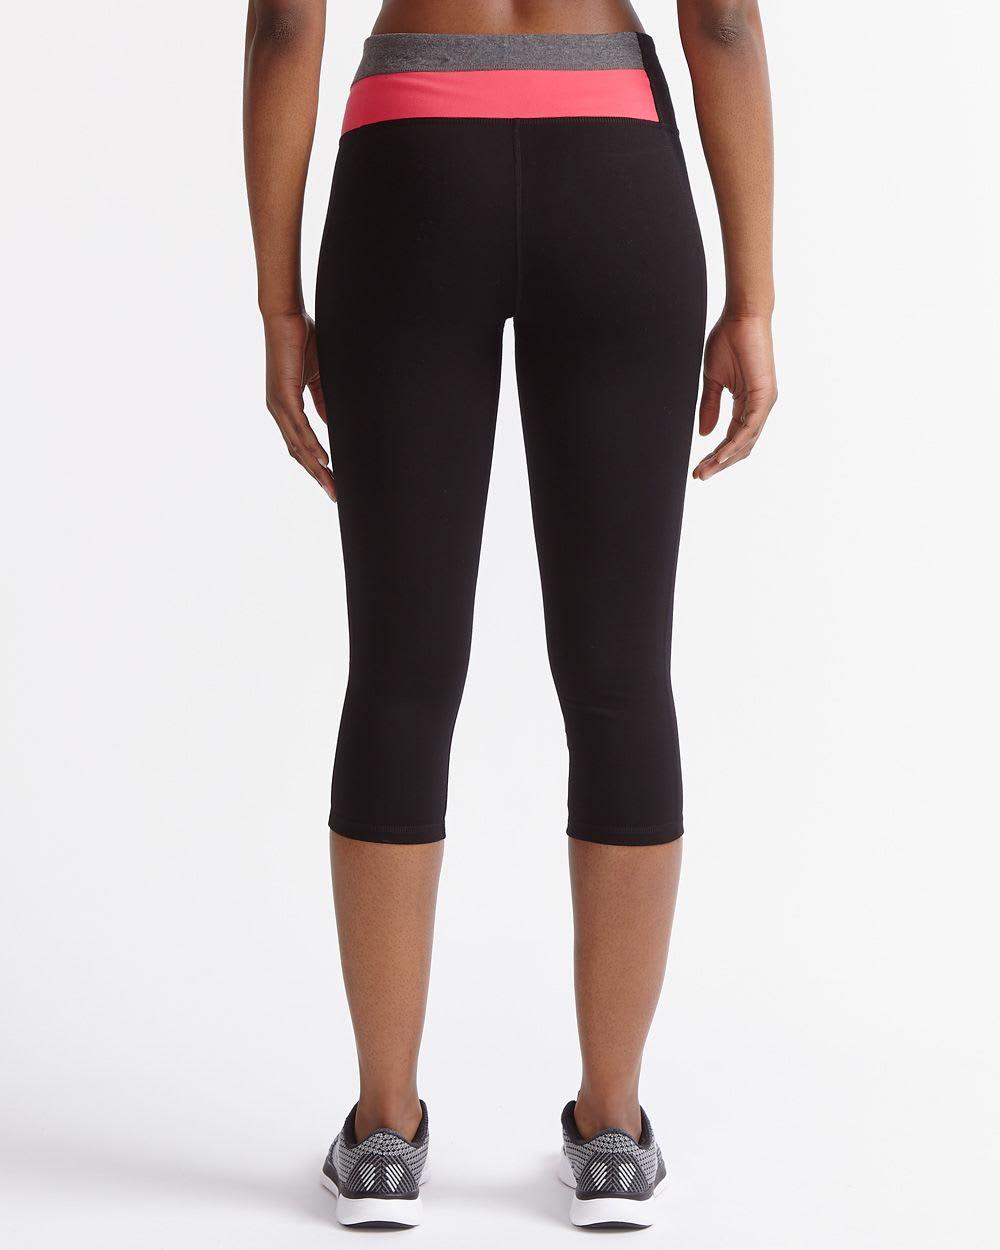 Hyba Yoga Capri Legging